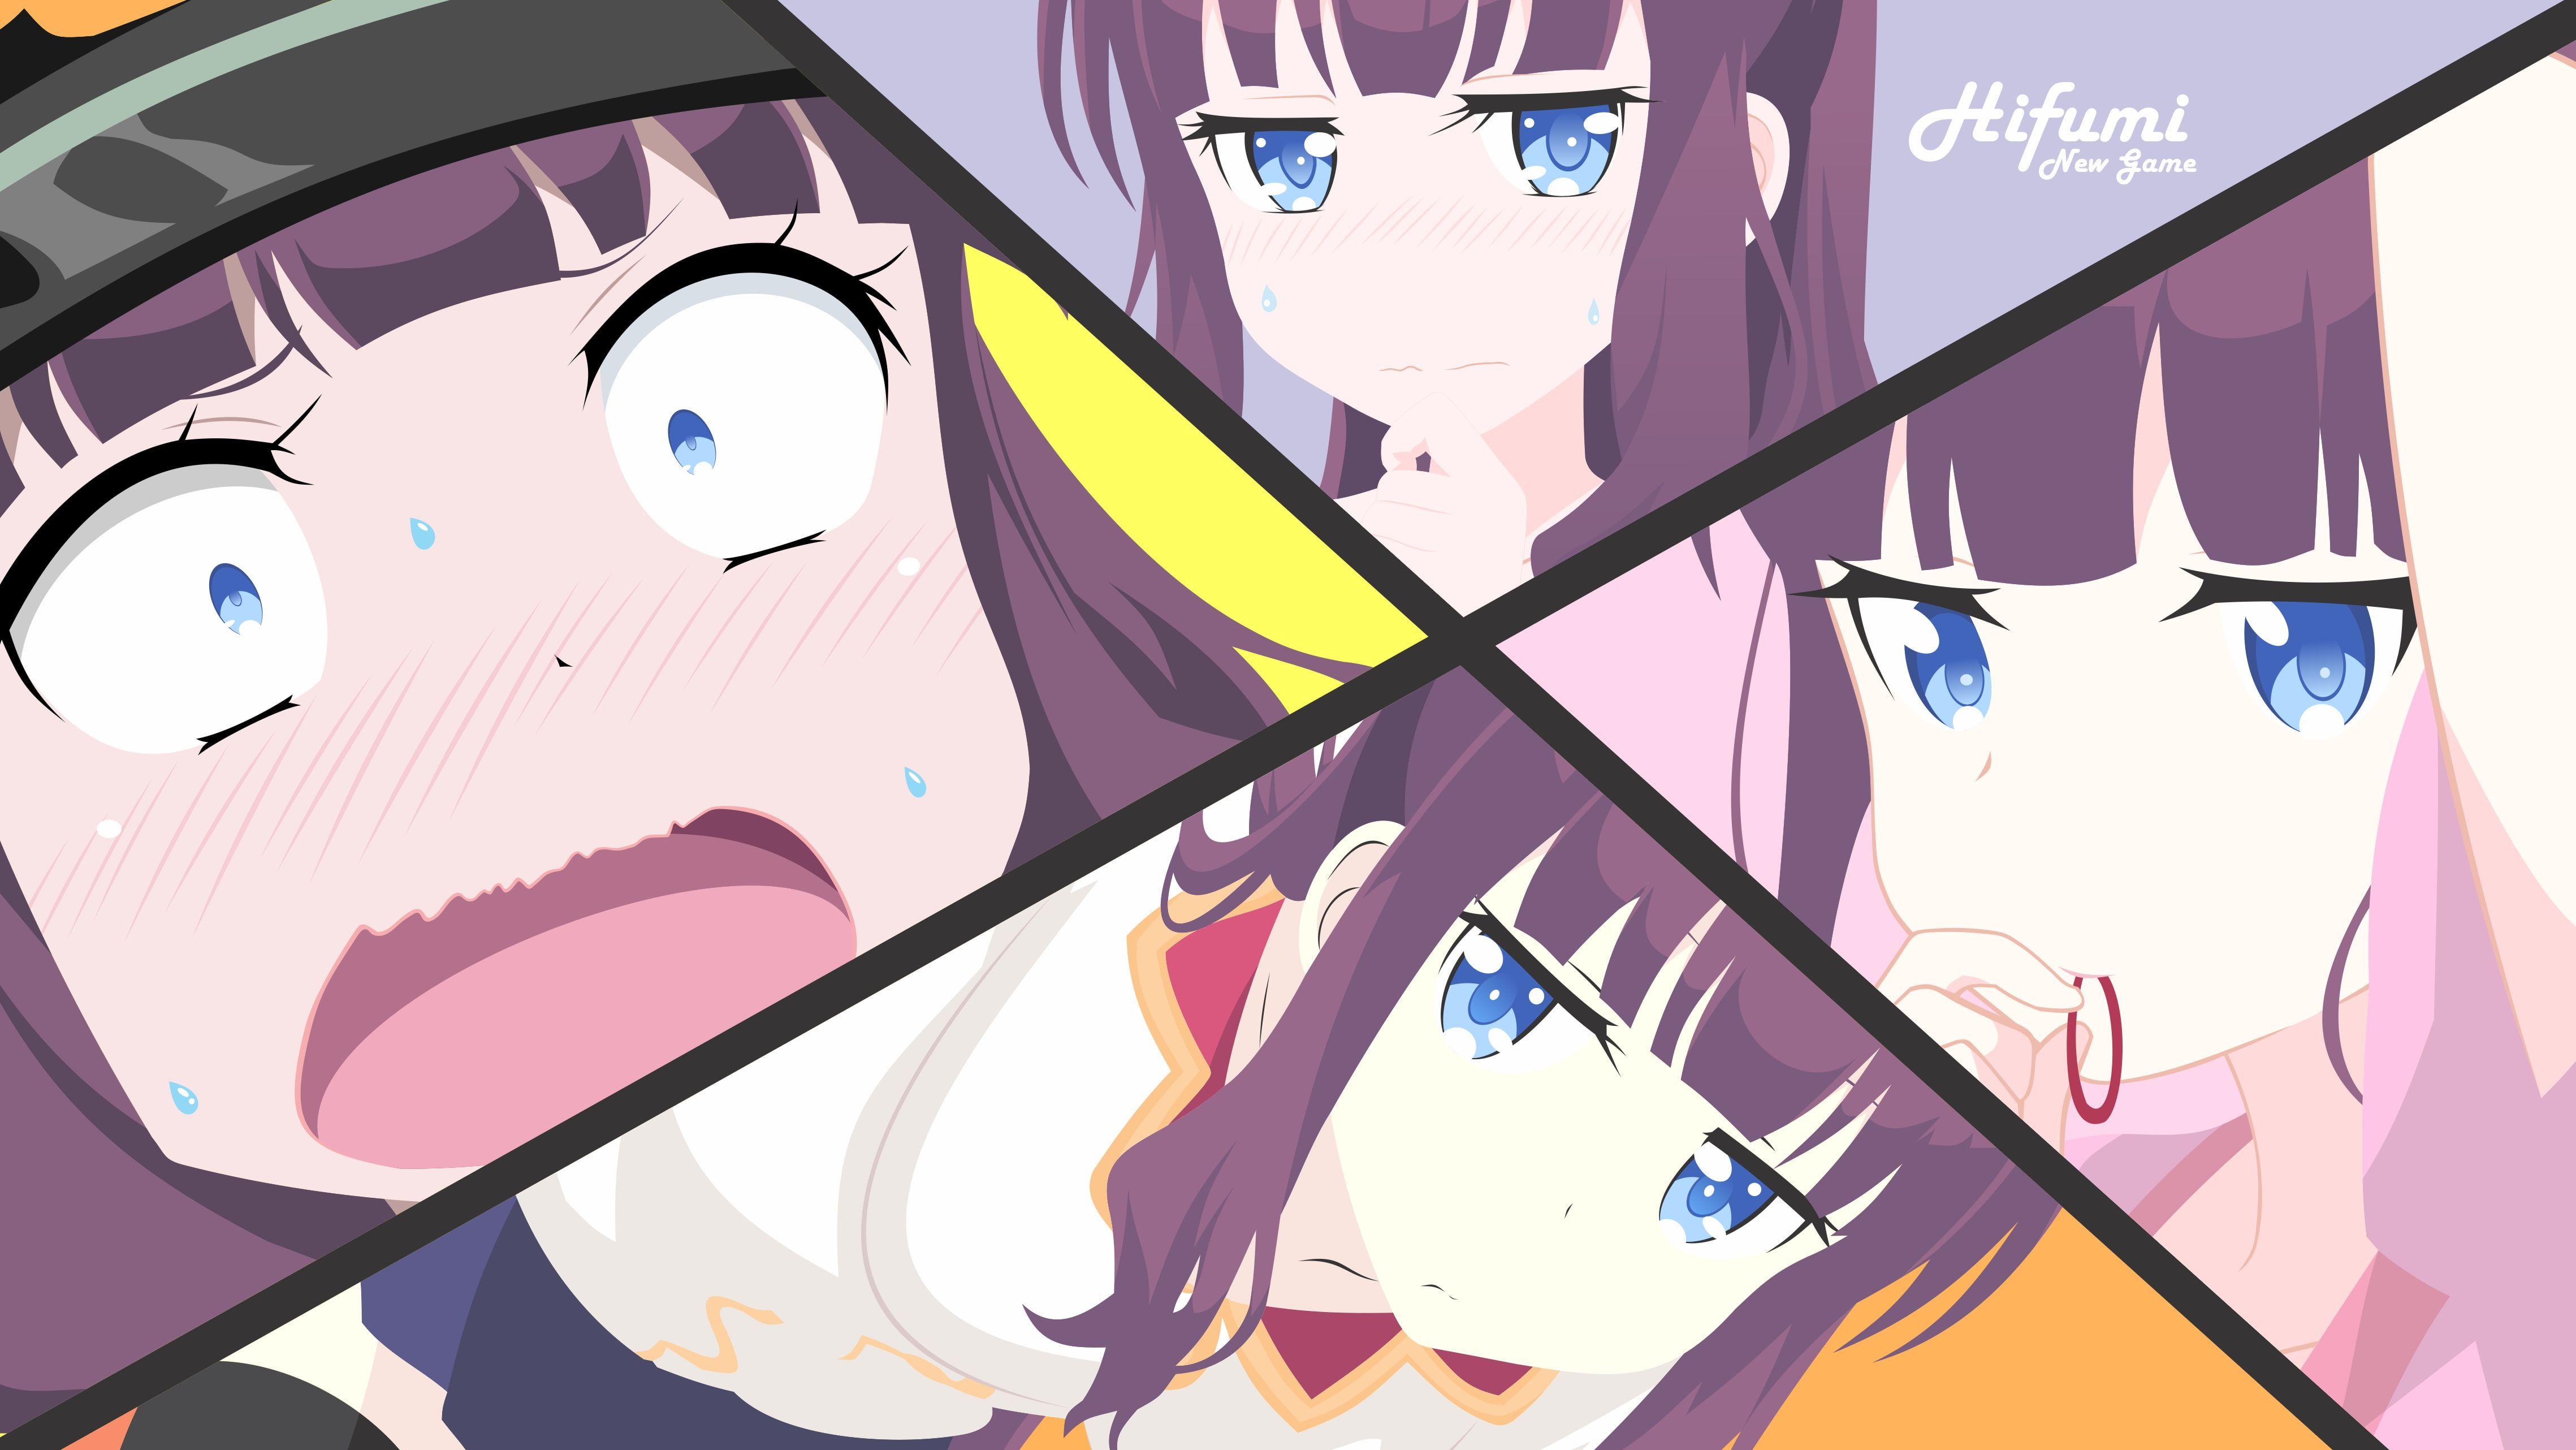 Anime New Game! Hifumi Takimoto 4K wallpaper